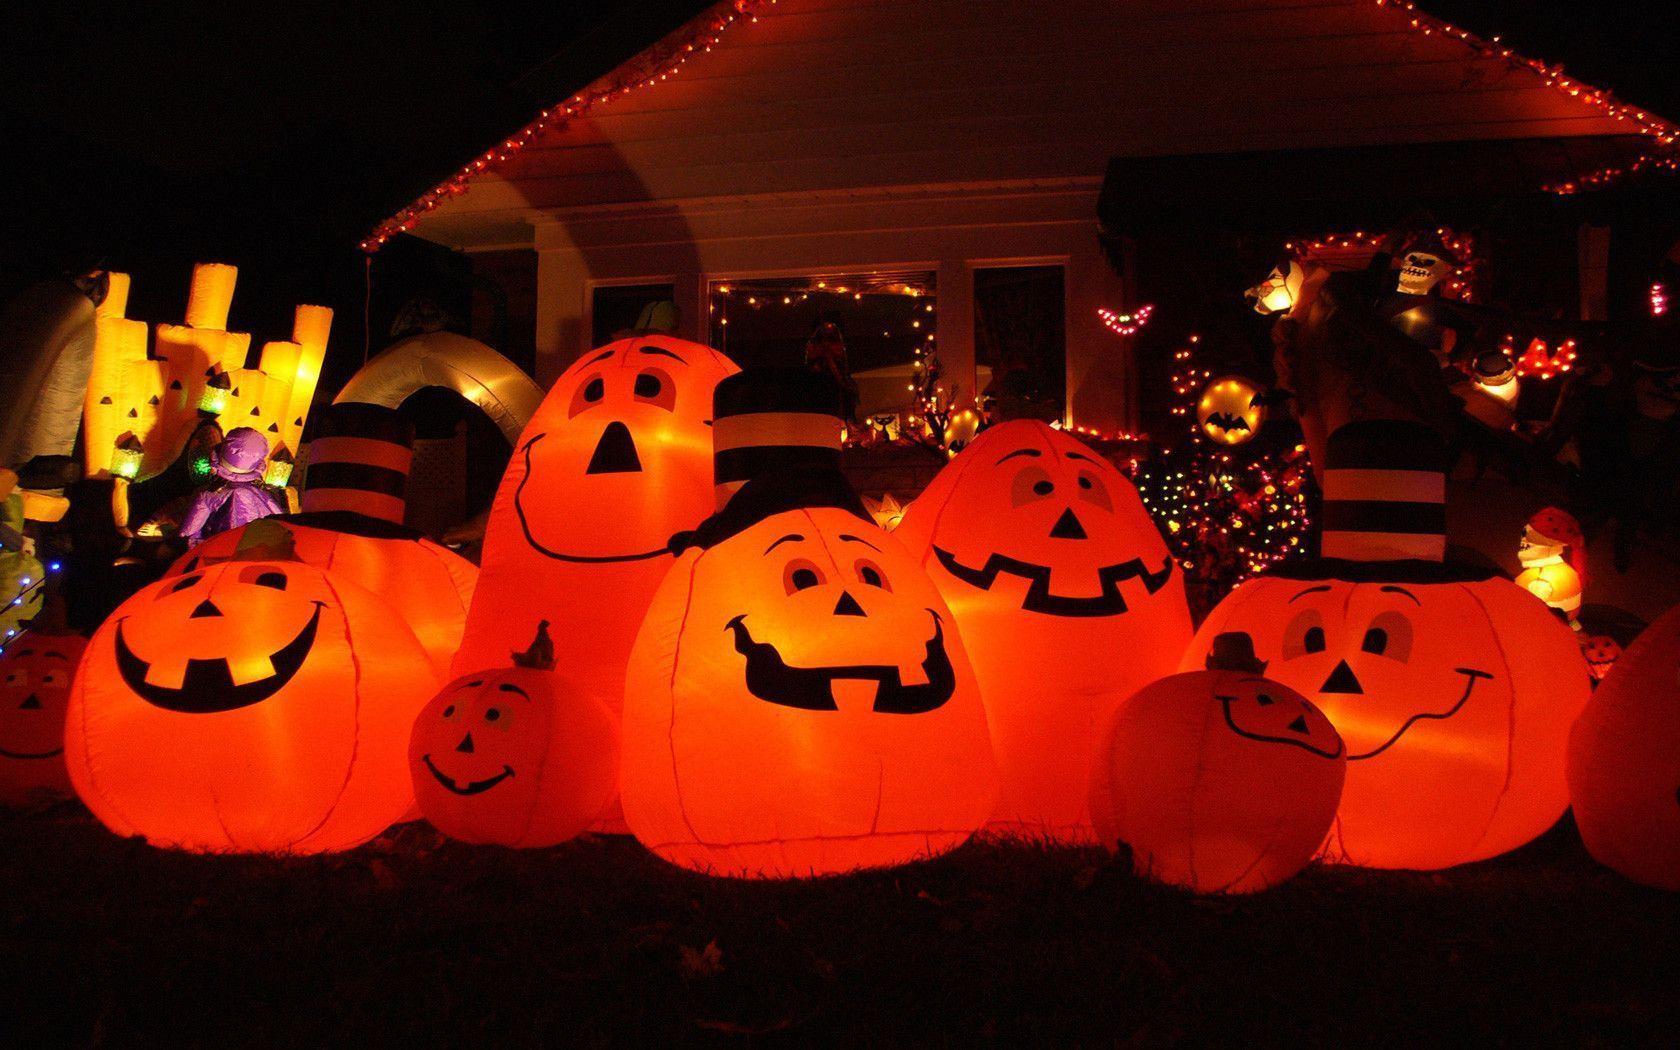 halloween wallpapers free - photo #29